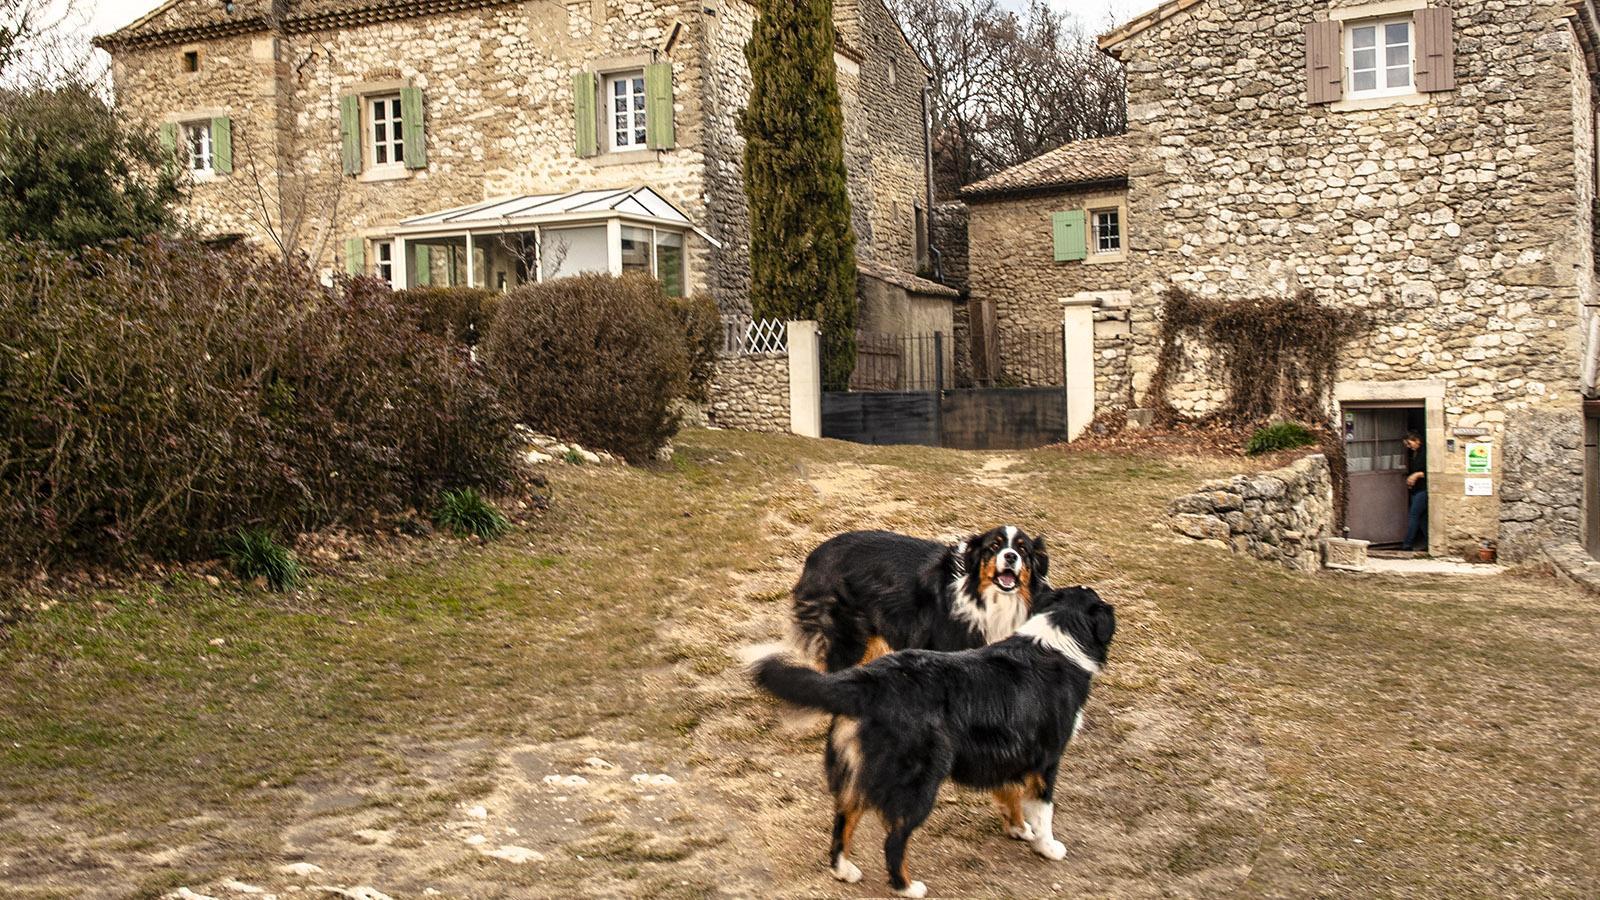 Zum Trüffelhof Eybrachas gehören diese beiden Hunde. Foto: Hilke Maunder